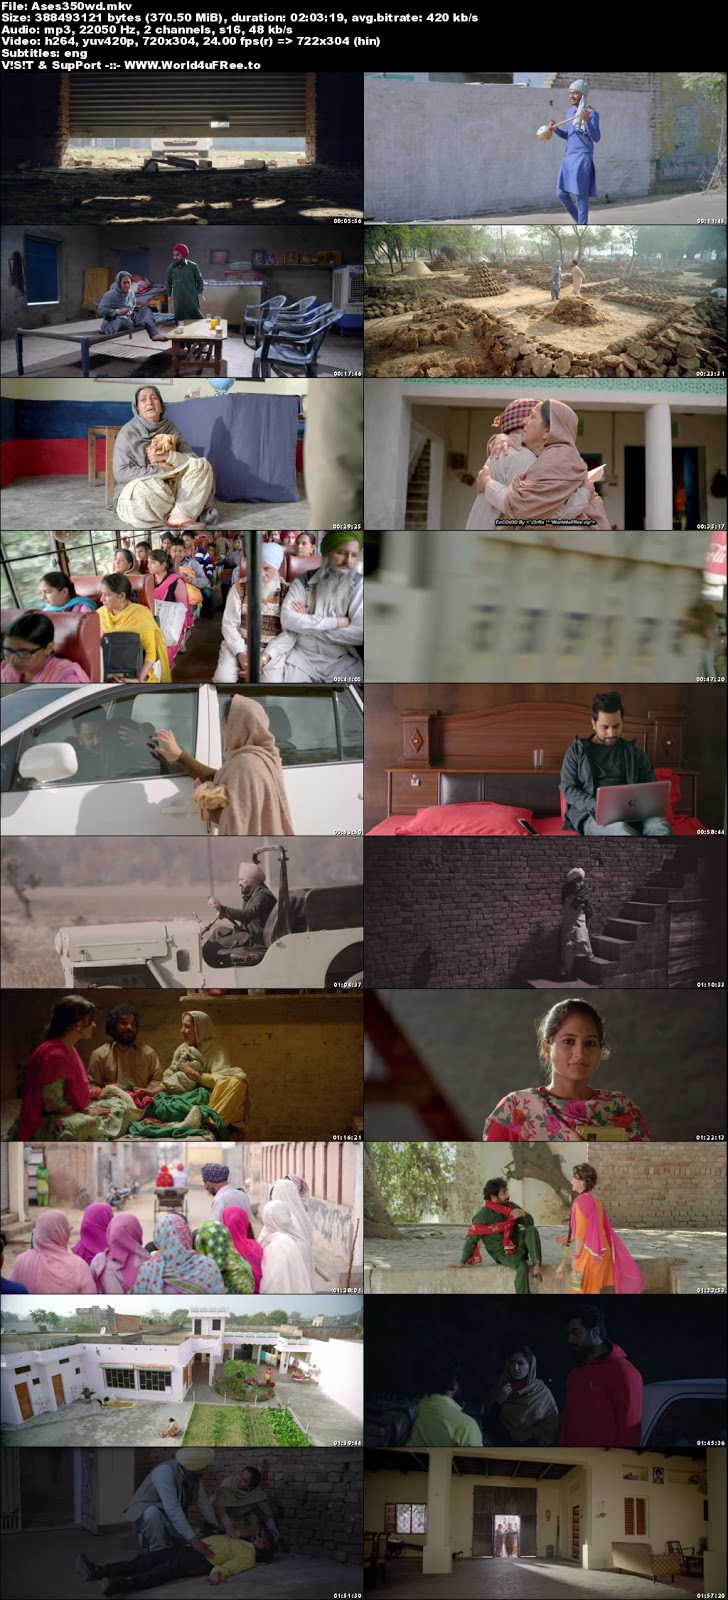 Asees 2018 Punjabi HDRip 480p 350Mb Download world4ufree.fun , hindi movie Asees 2018 hdrip 720p bollywood movie Asees 2018 720p LATEST MOVie Asees 2018 720p DVDRip NEW MOVIE Asees 2018 720p WEBHD 700mb free download or watch online at world4ufree.fun